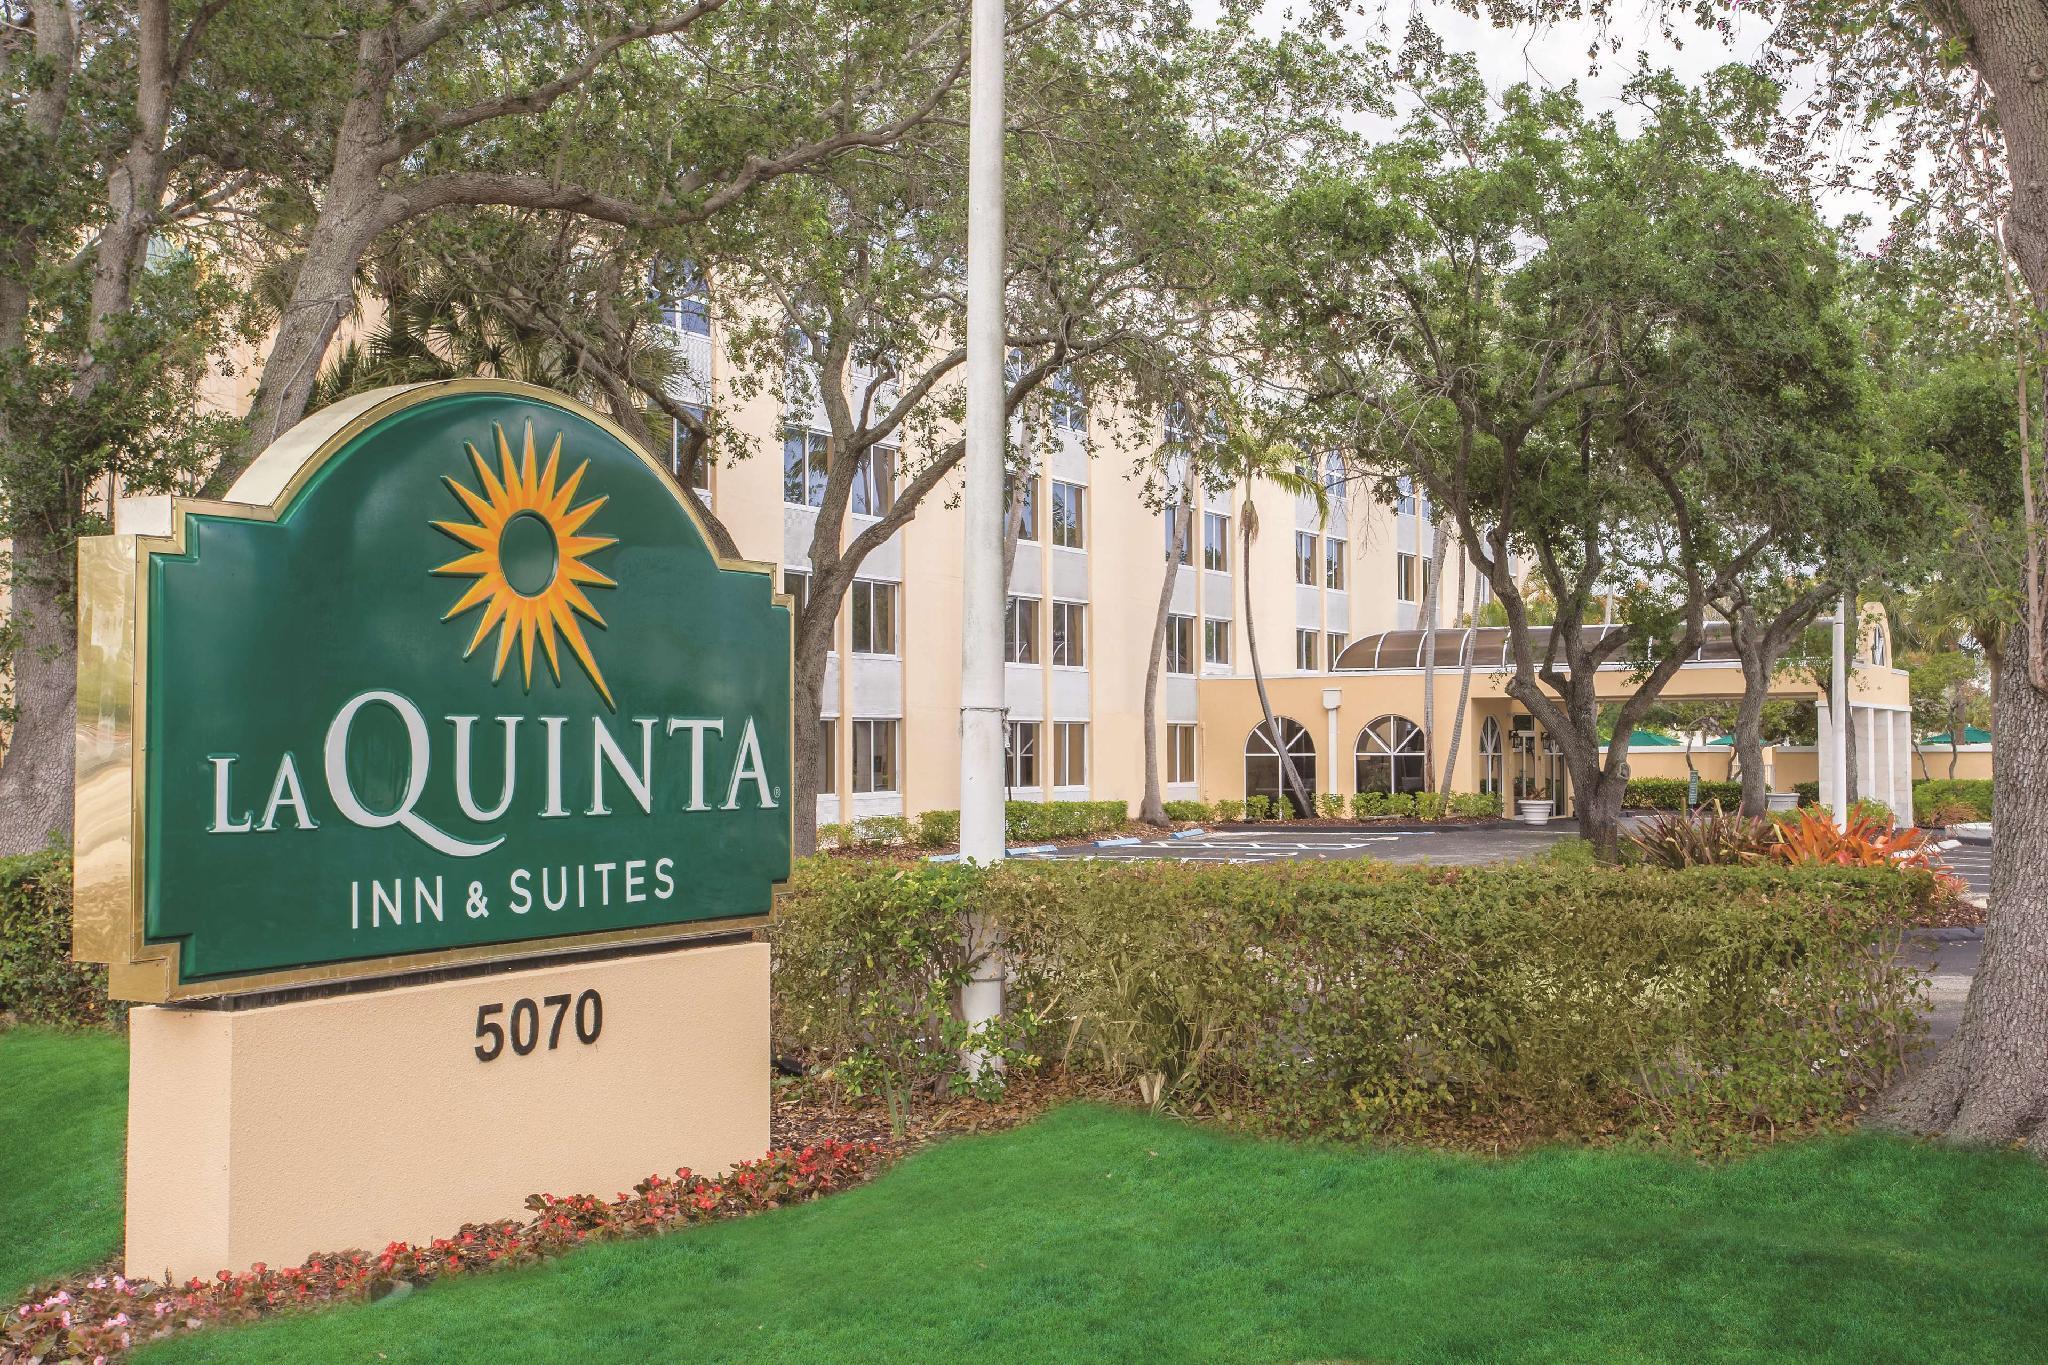 La Quinta Inn And Suites By Wyndham Fort Lauderdale Tamarac